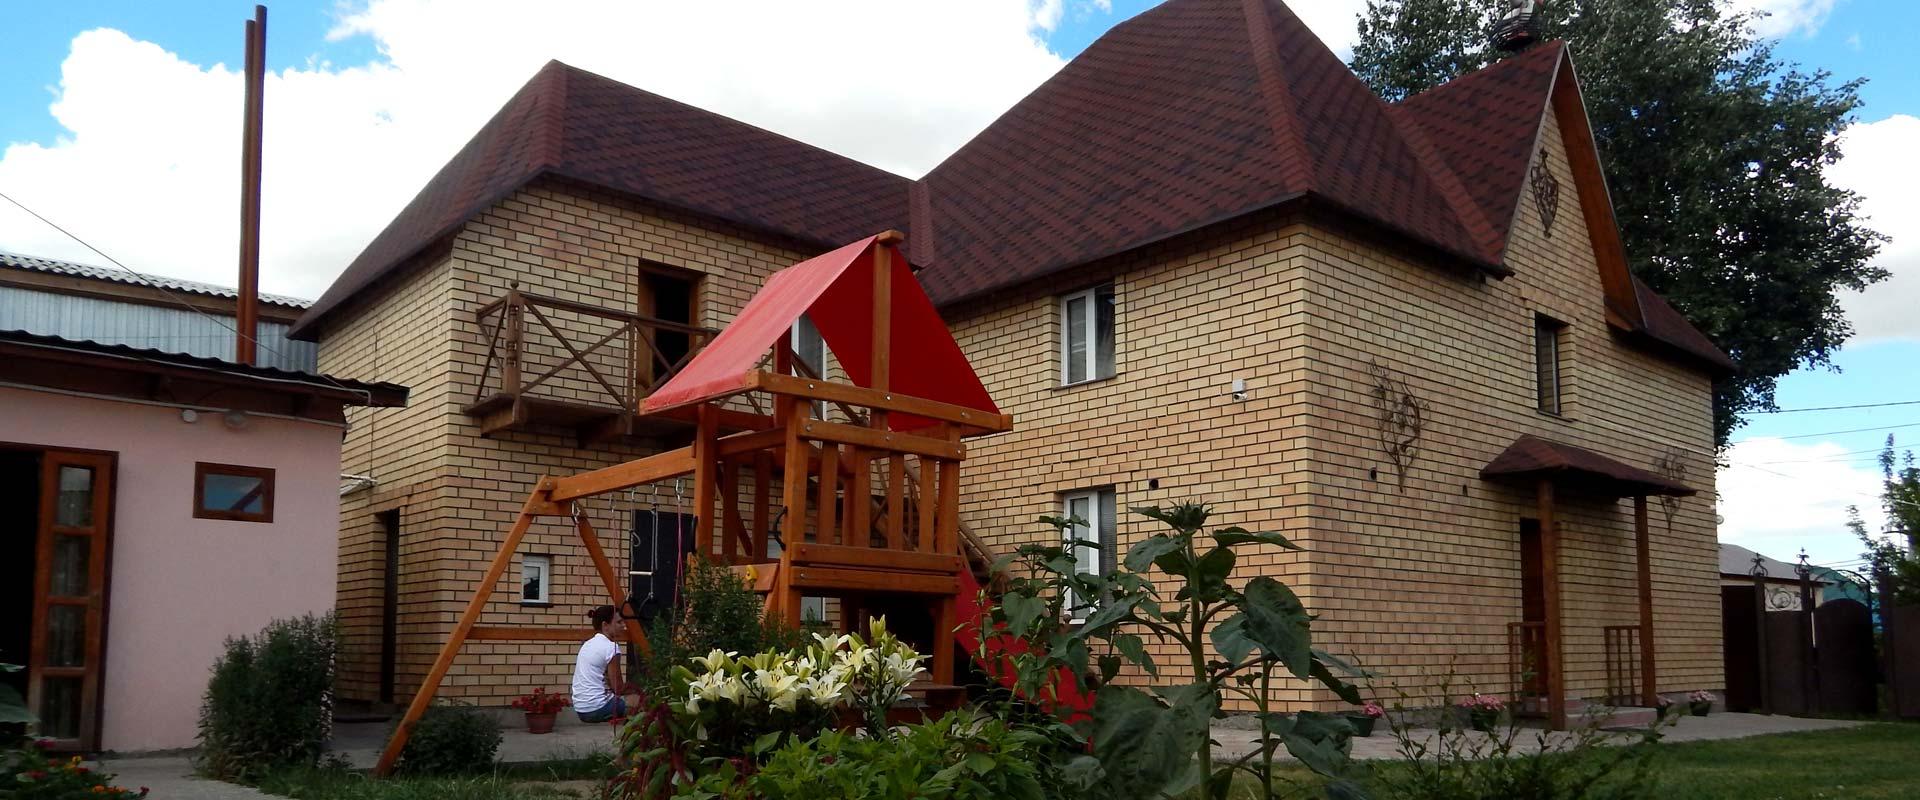 solt-Iletsk hotel atika4